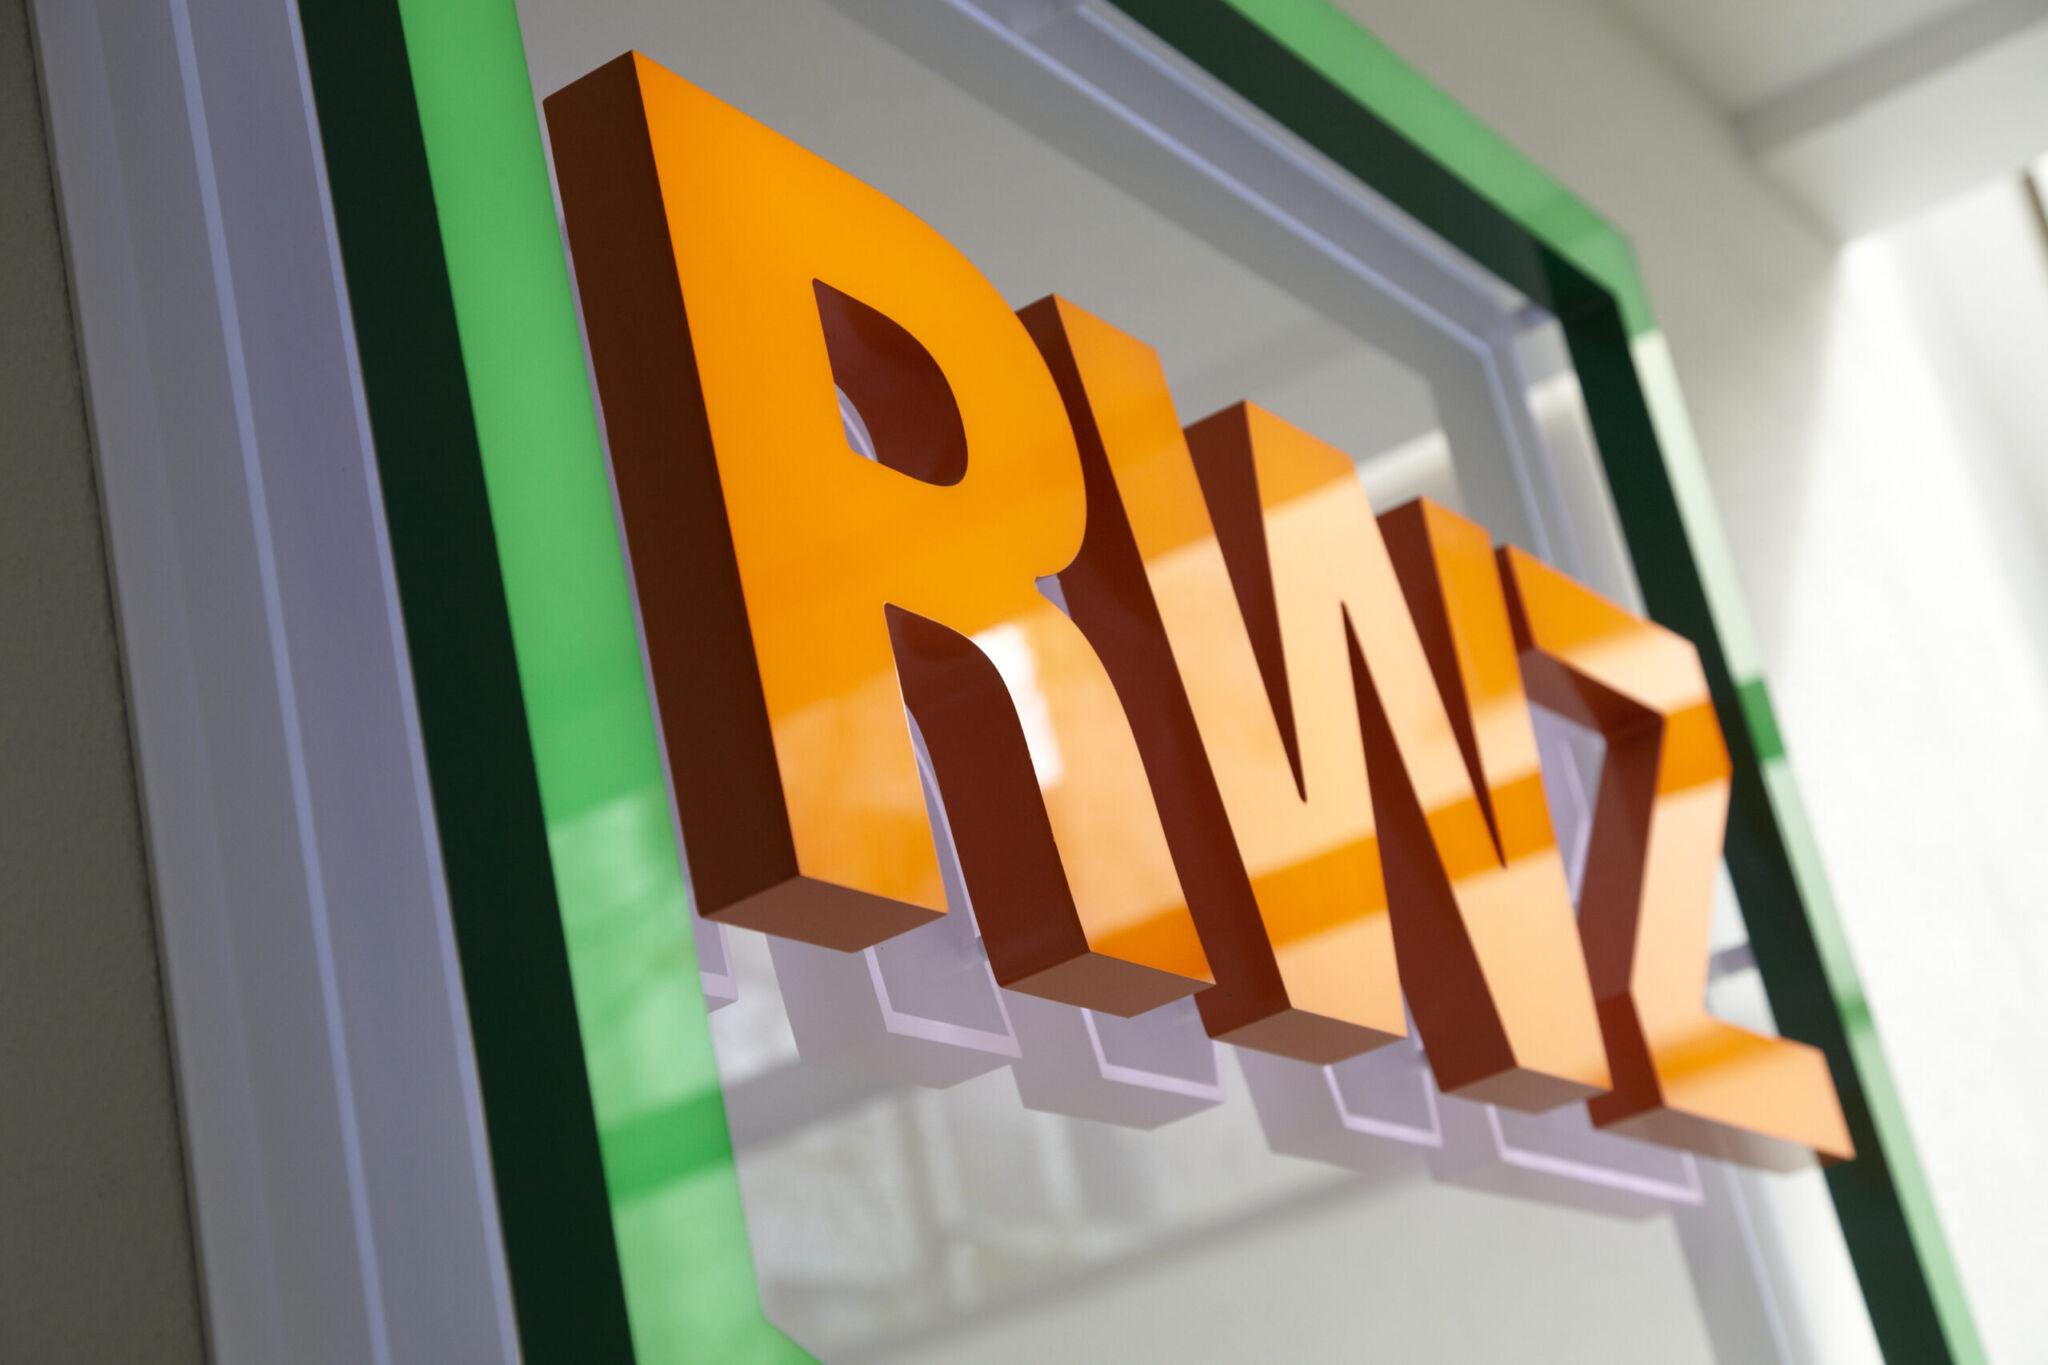 RWZ Logo |copyright: RWZ Rhein-Main eG